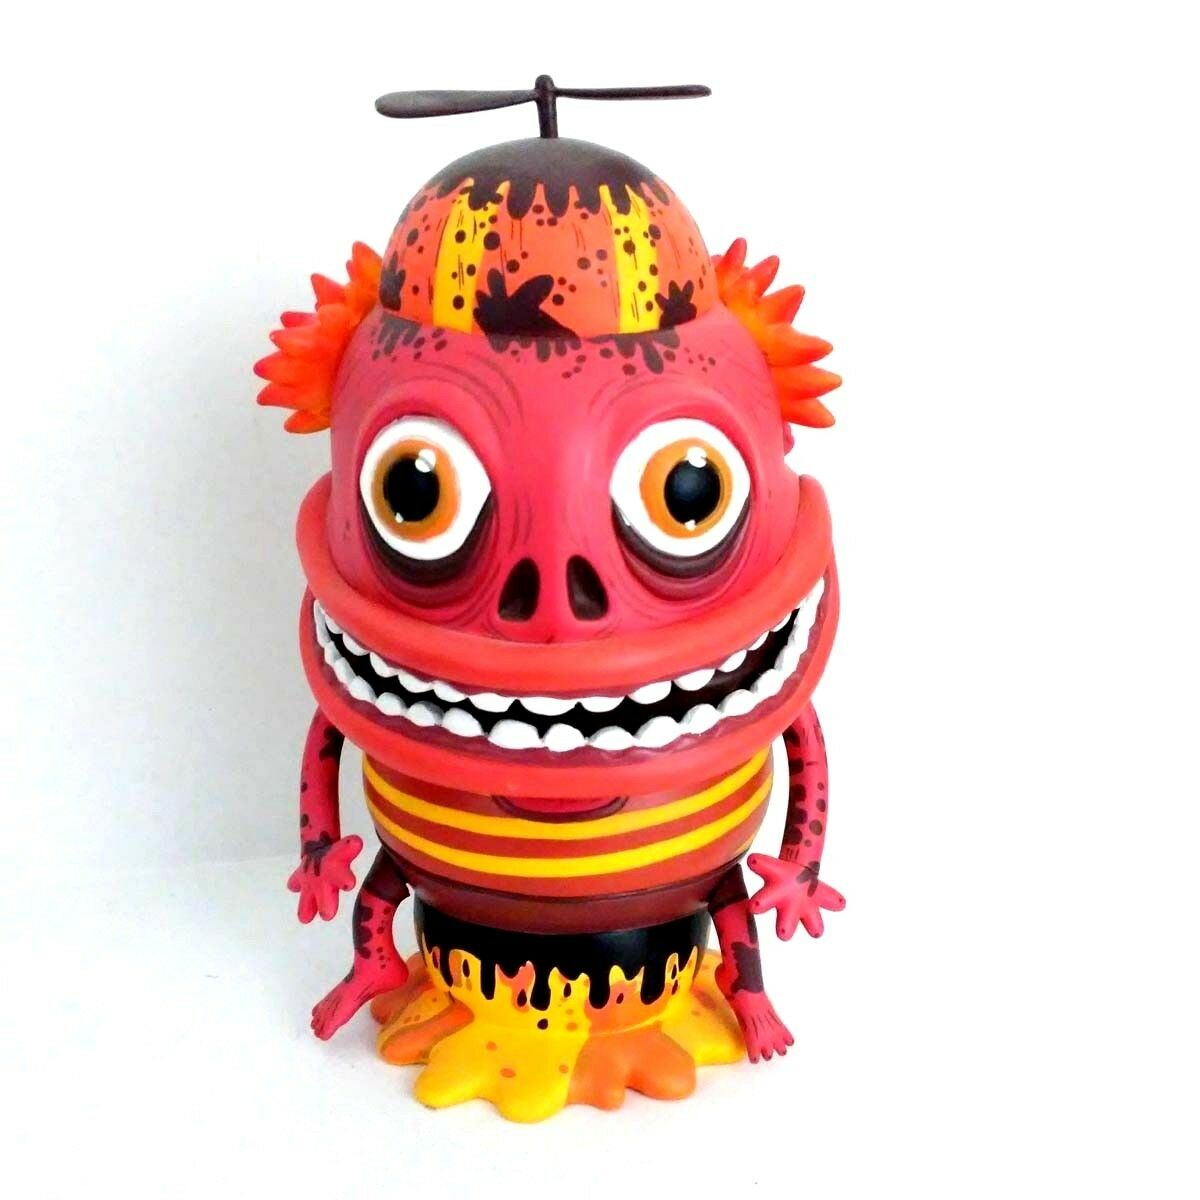 The Maniac Red orange by Skwak and Mindstyle 7.5  Vinyl Art Toy Figurine